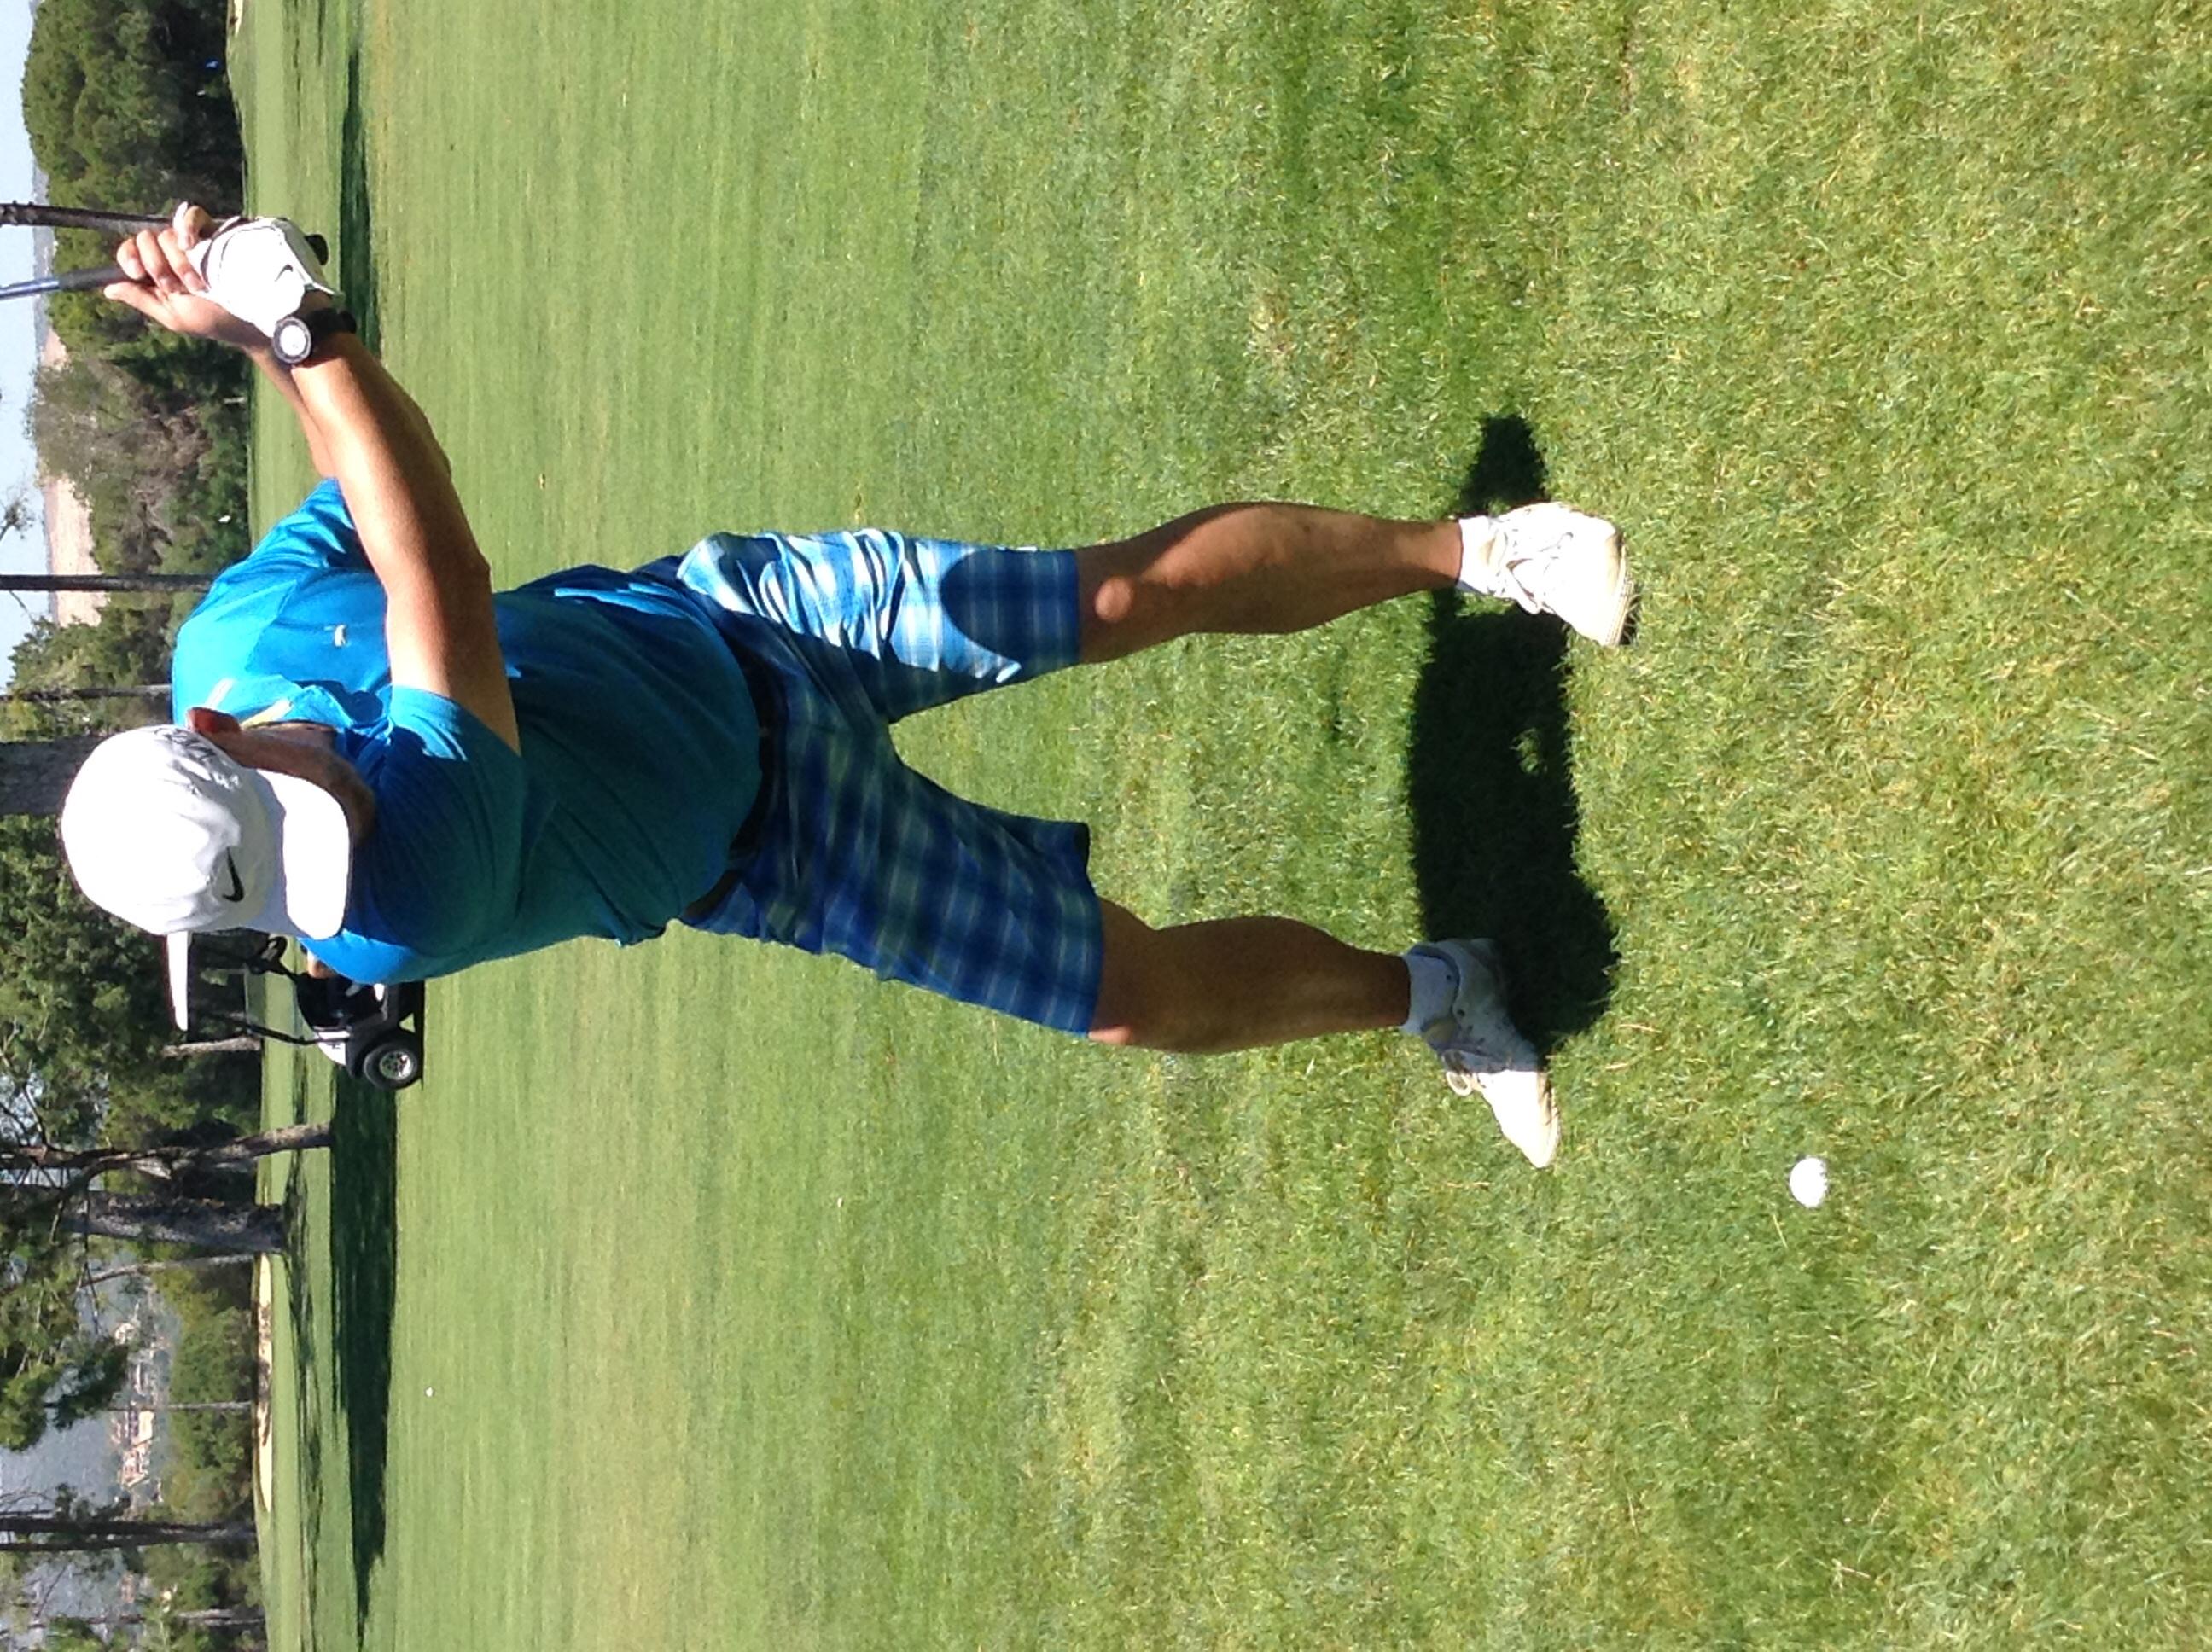 Avatar of golfer named Alain Gerard